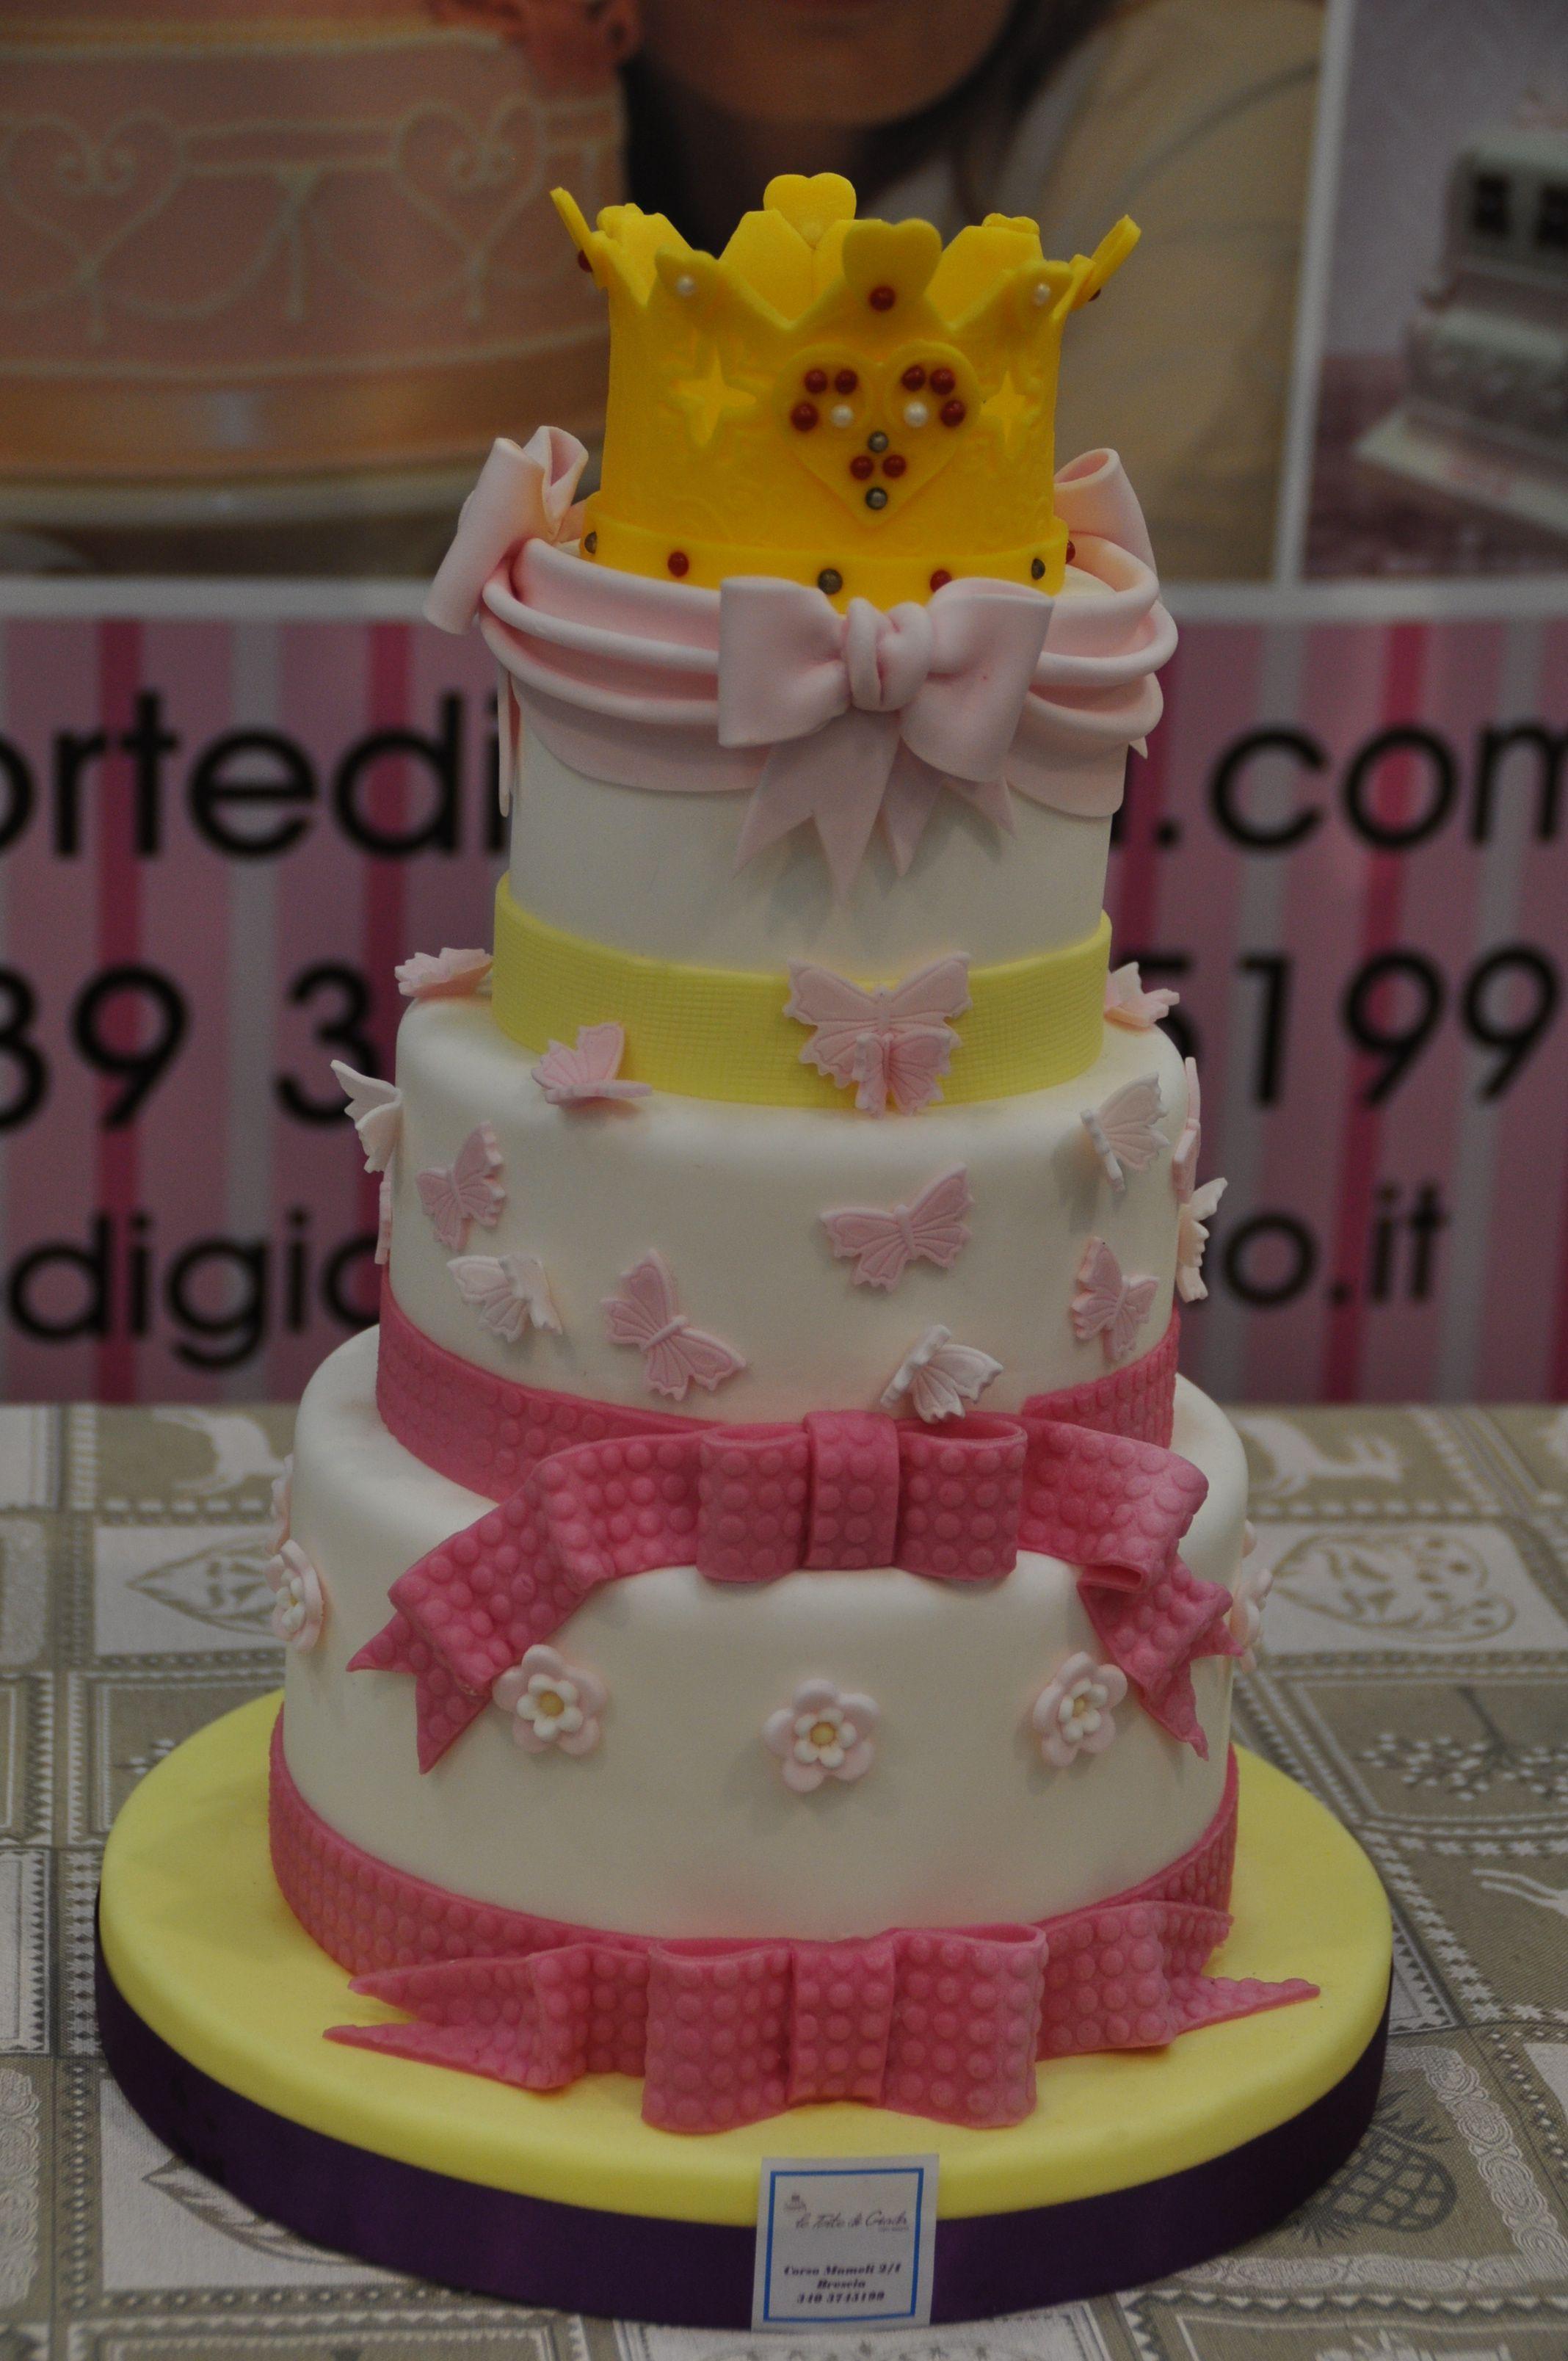 Torte Cake Design Torino : le-torte-di-giada-cake-design-senza-glutine 3 - Ginger ...